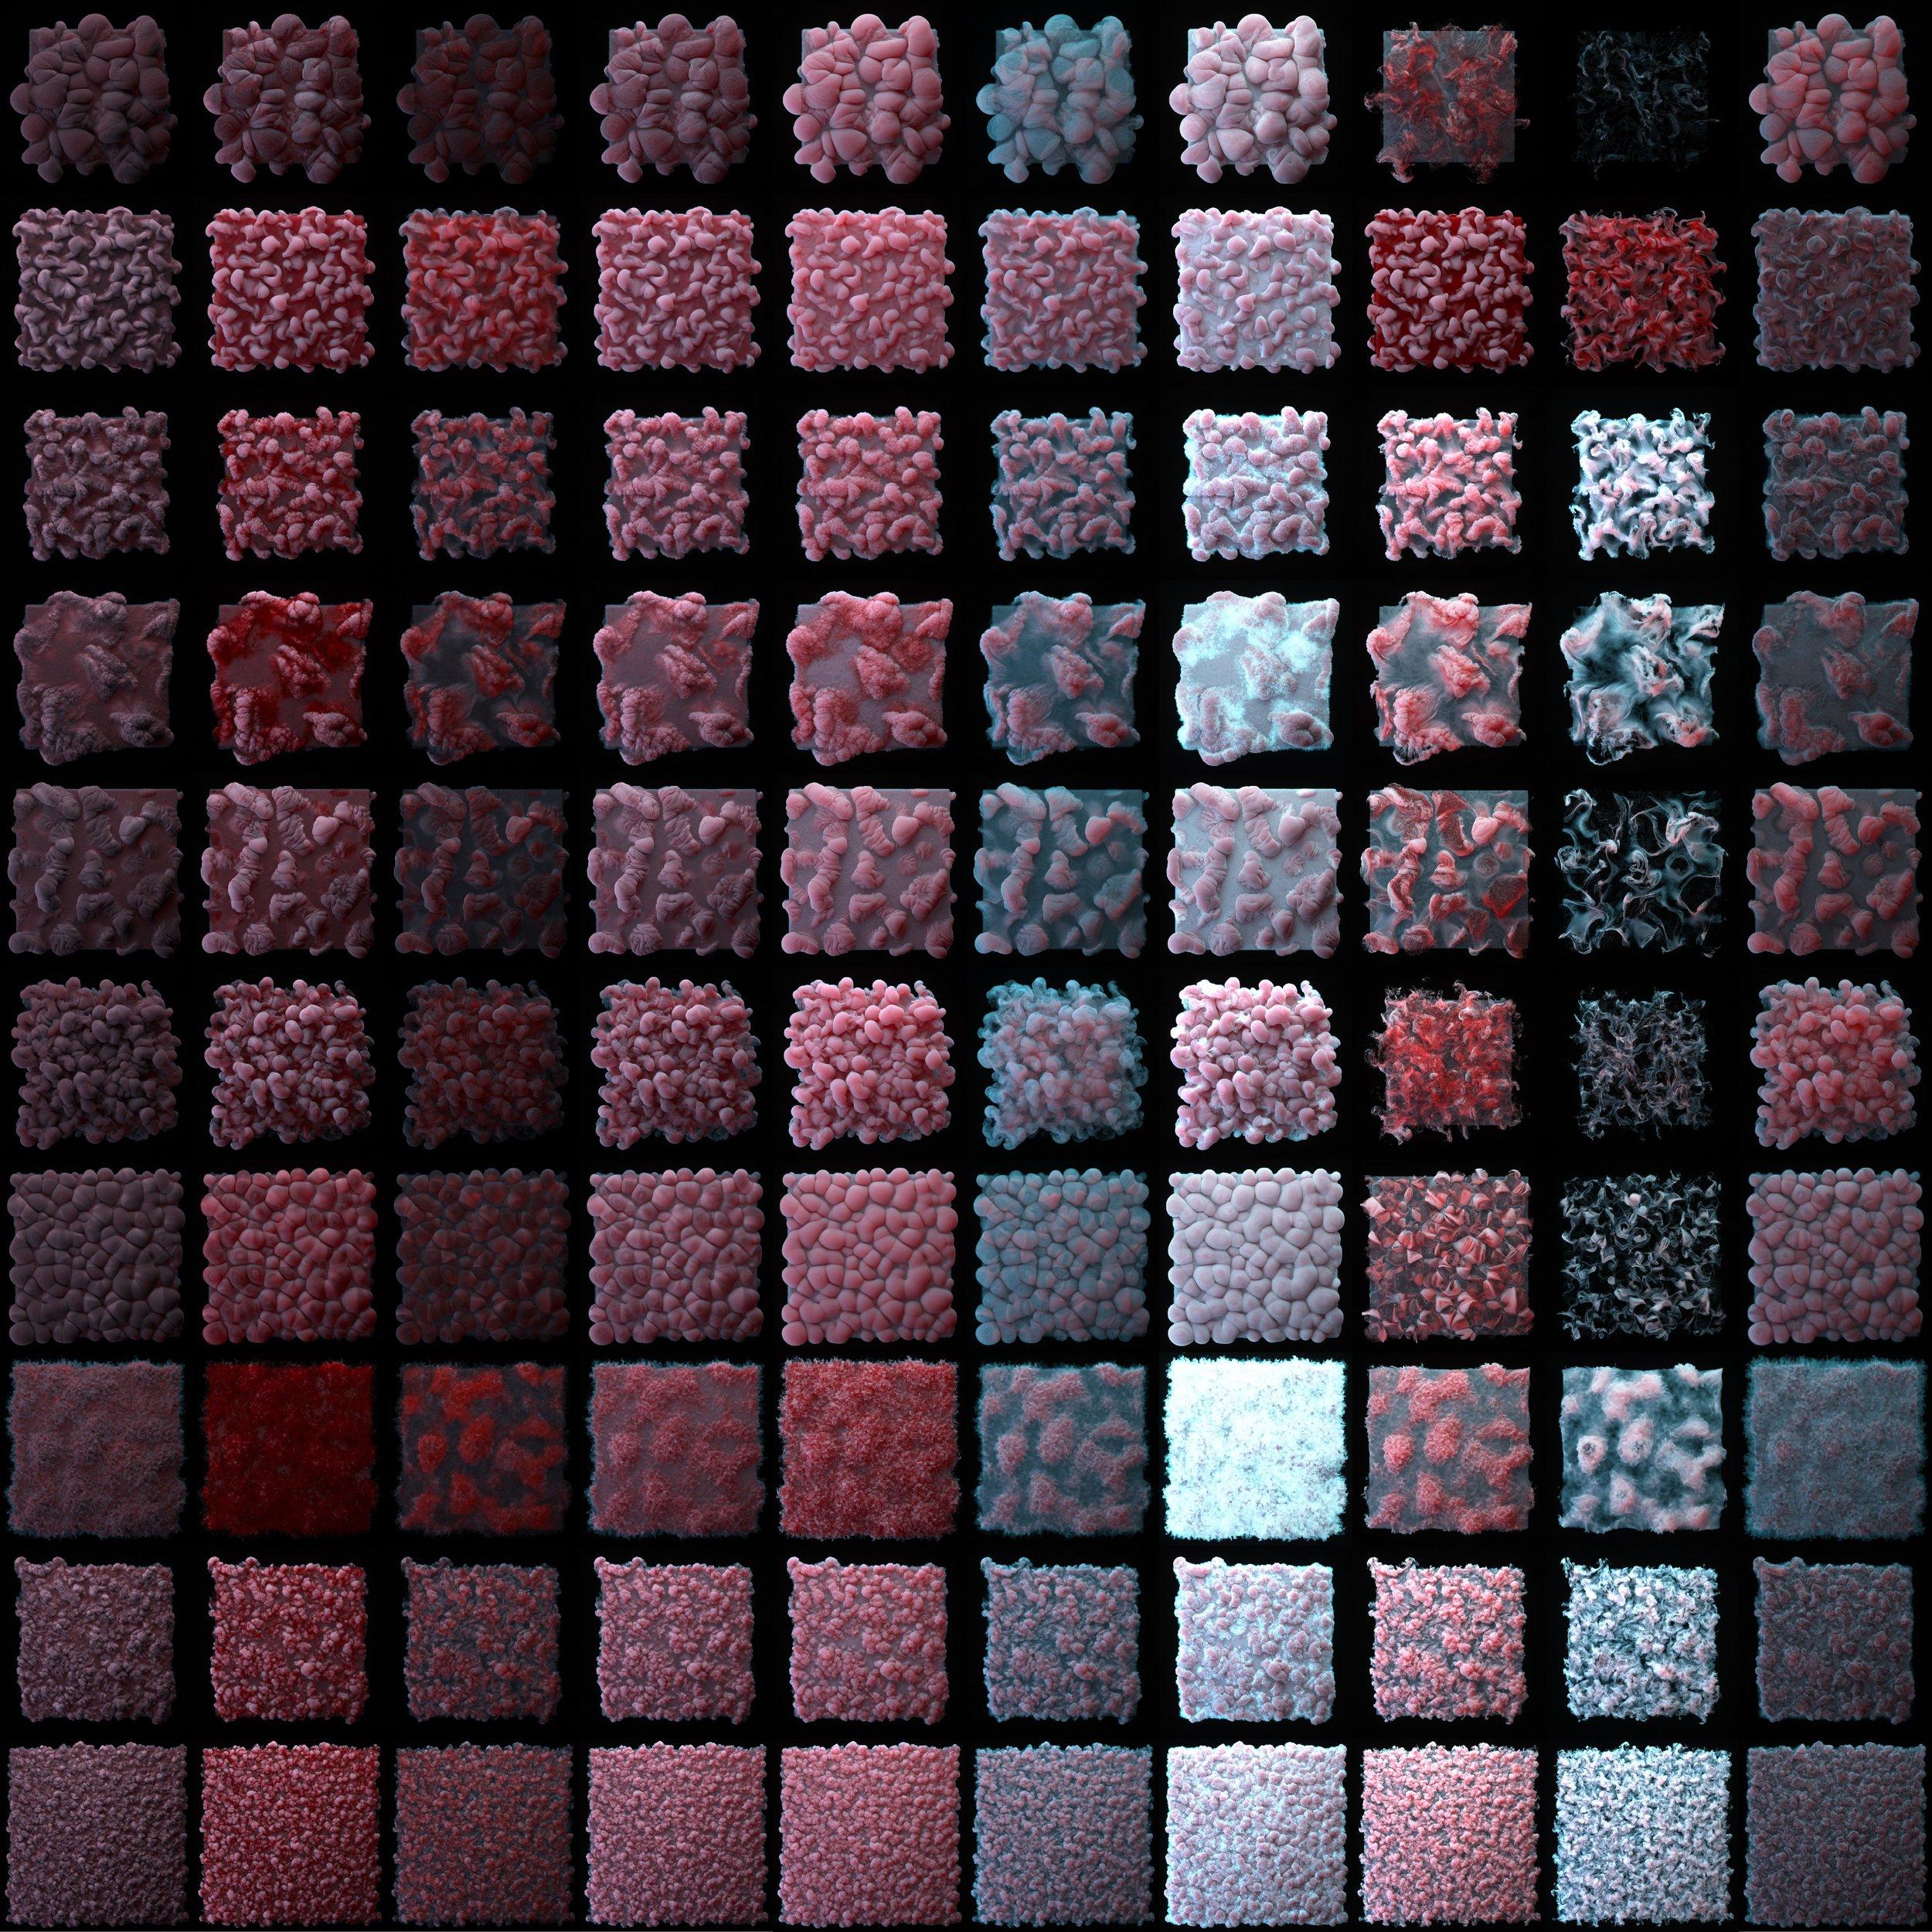 VDB - Frosty Fungus Thumbs.jpg